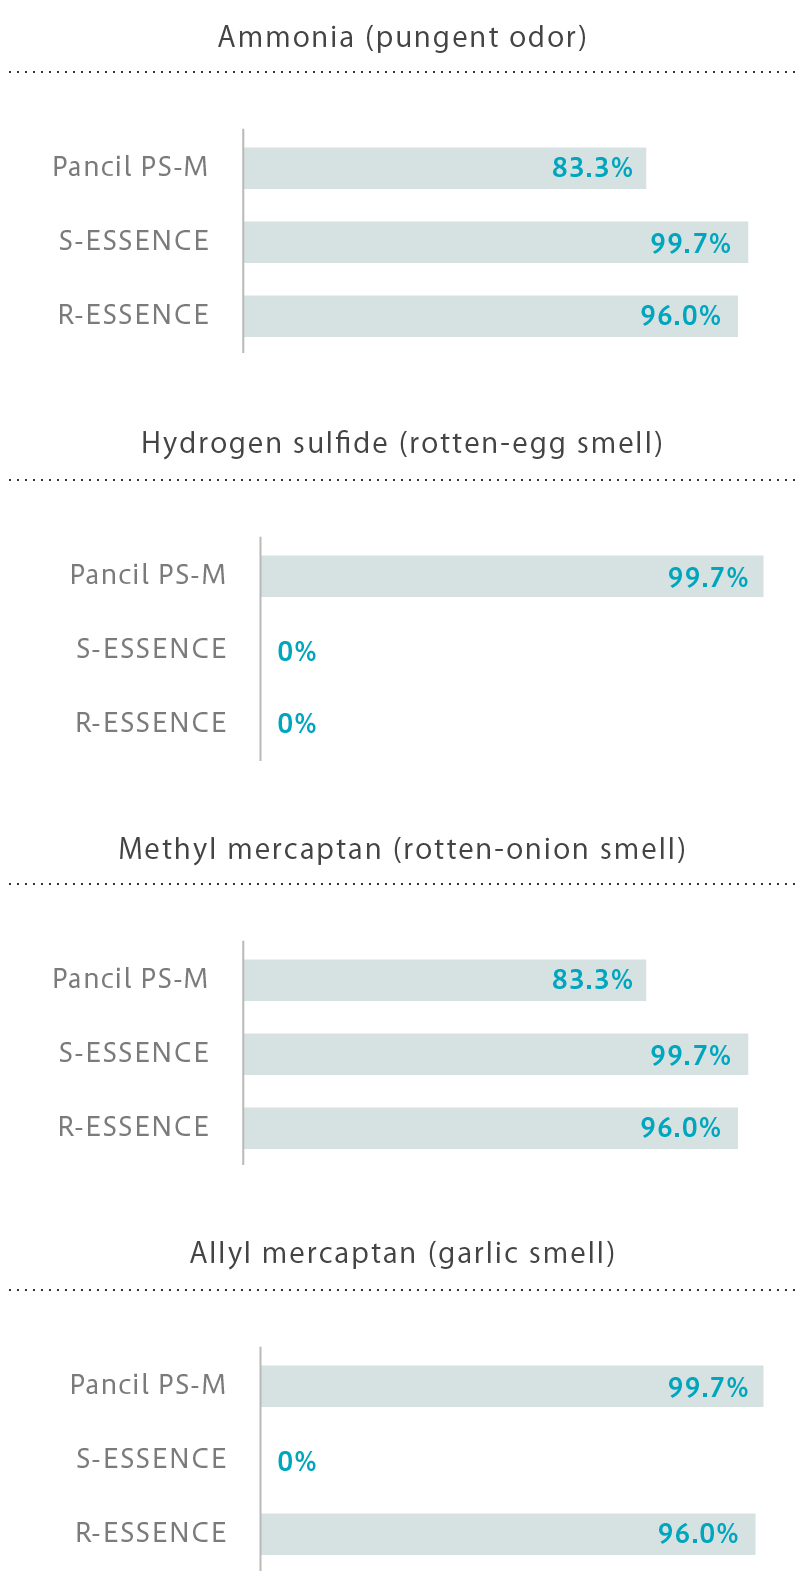 PANCIL Deodorant Performance